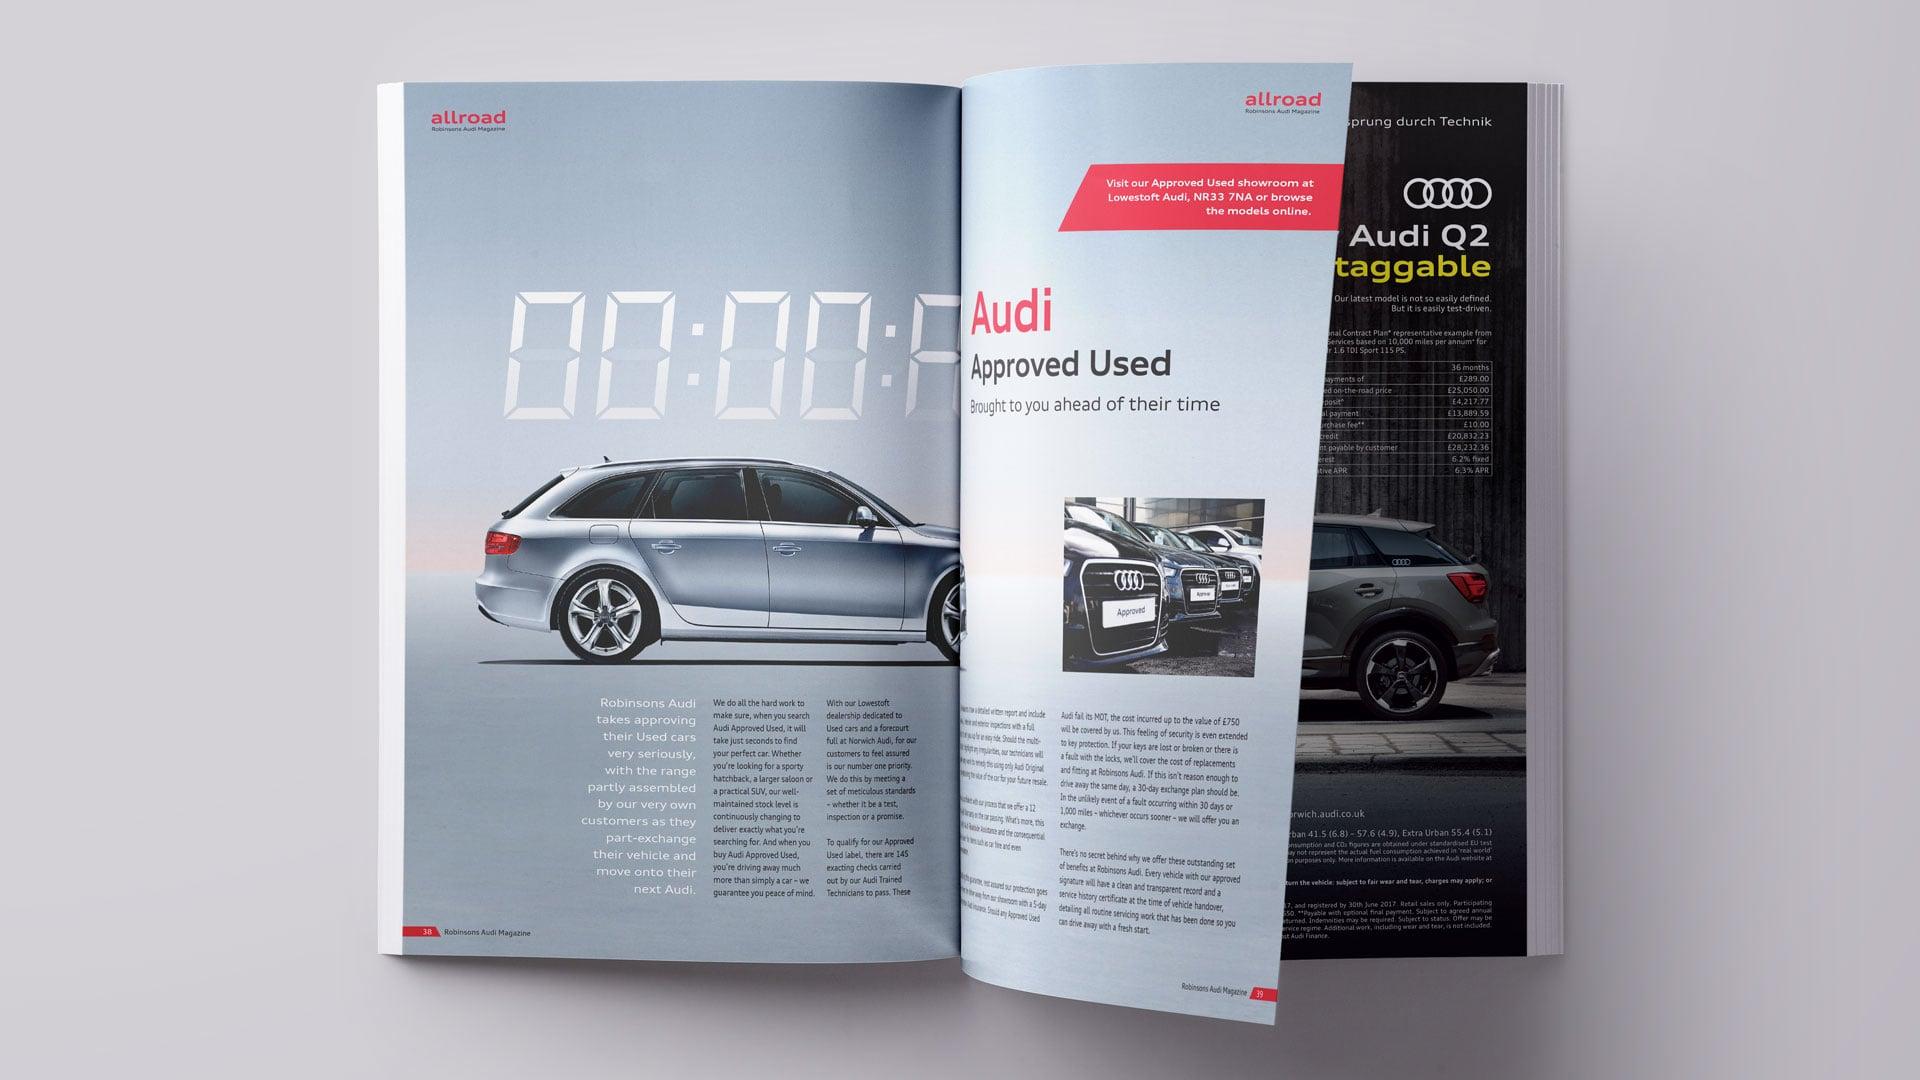 Robinsons Audi allroad magazine approved used spread mockup print design